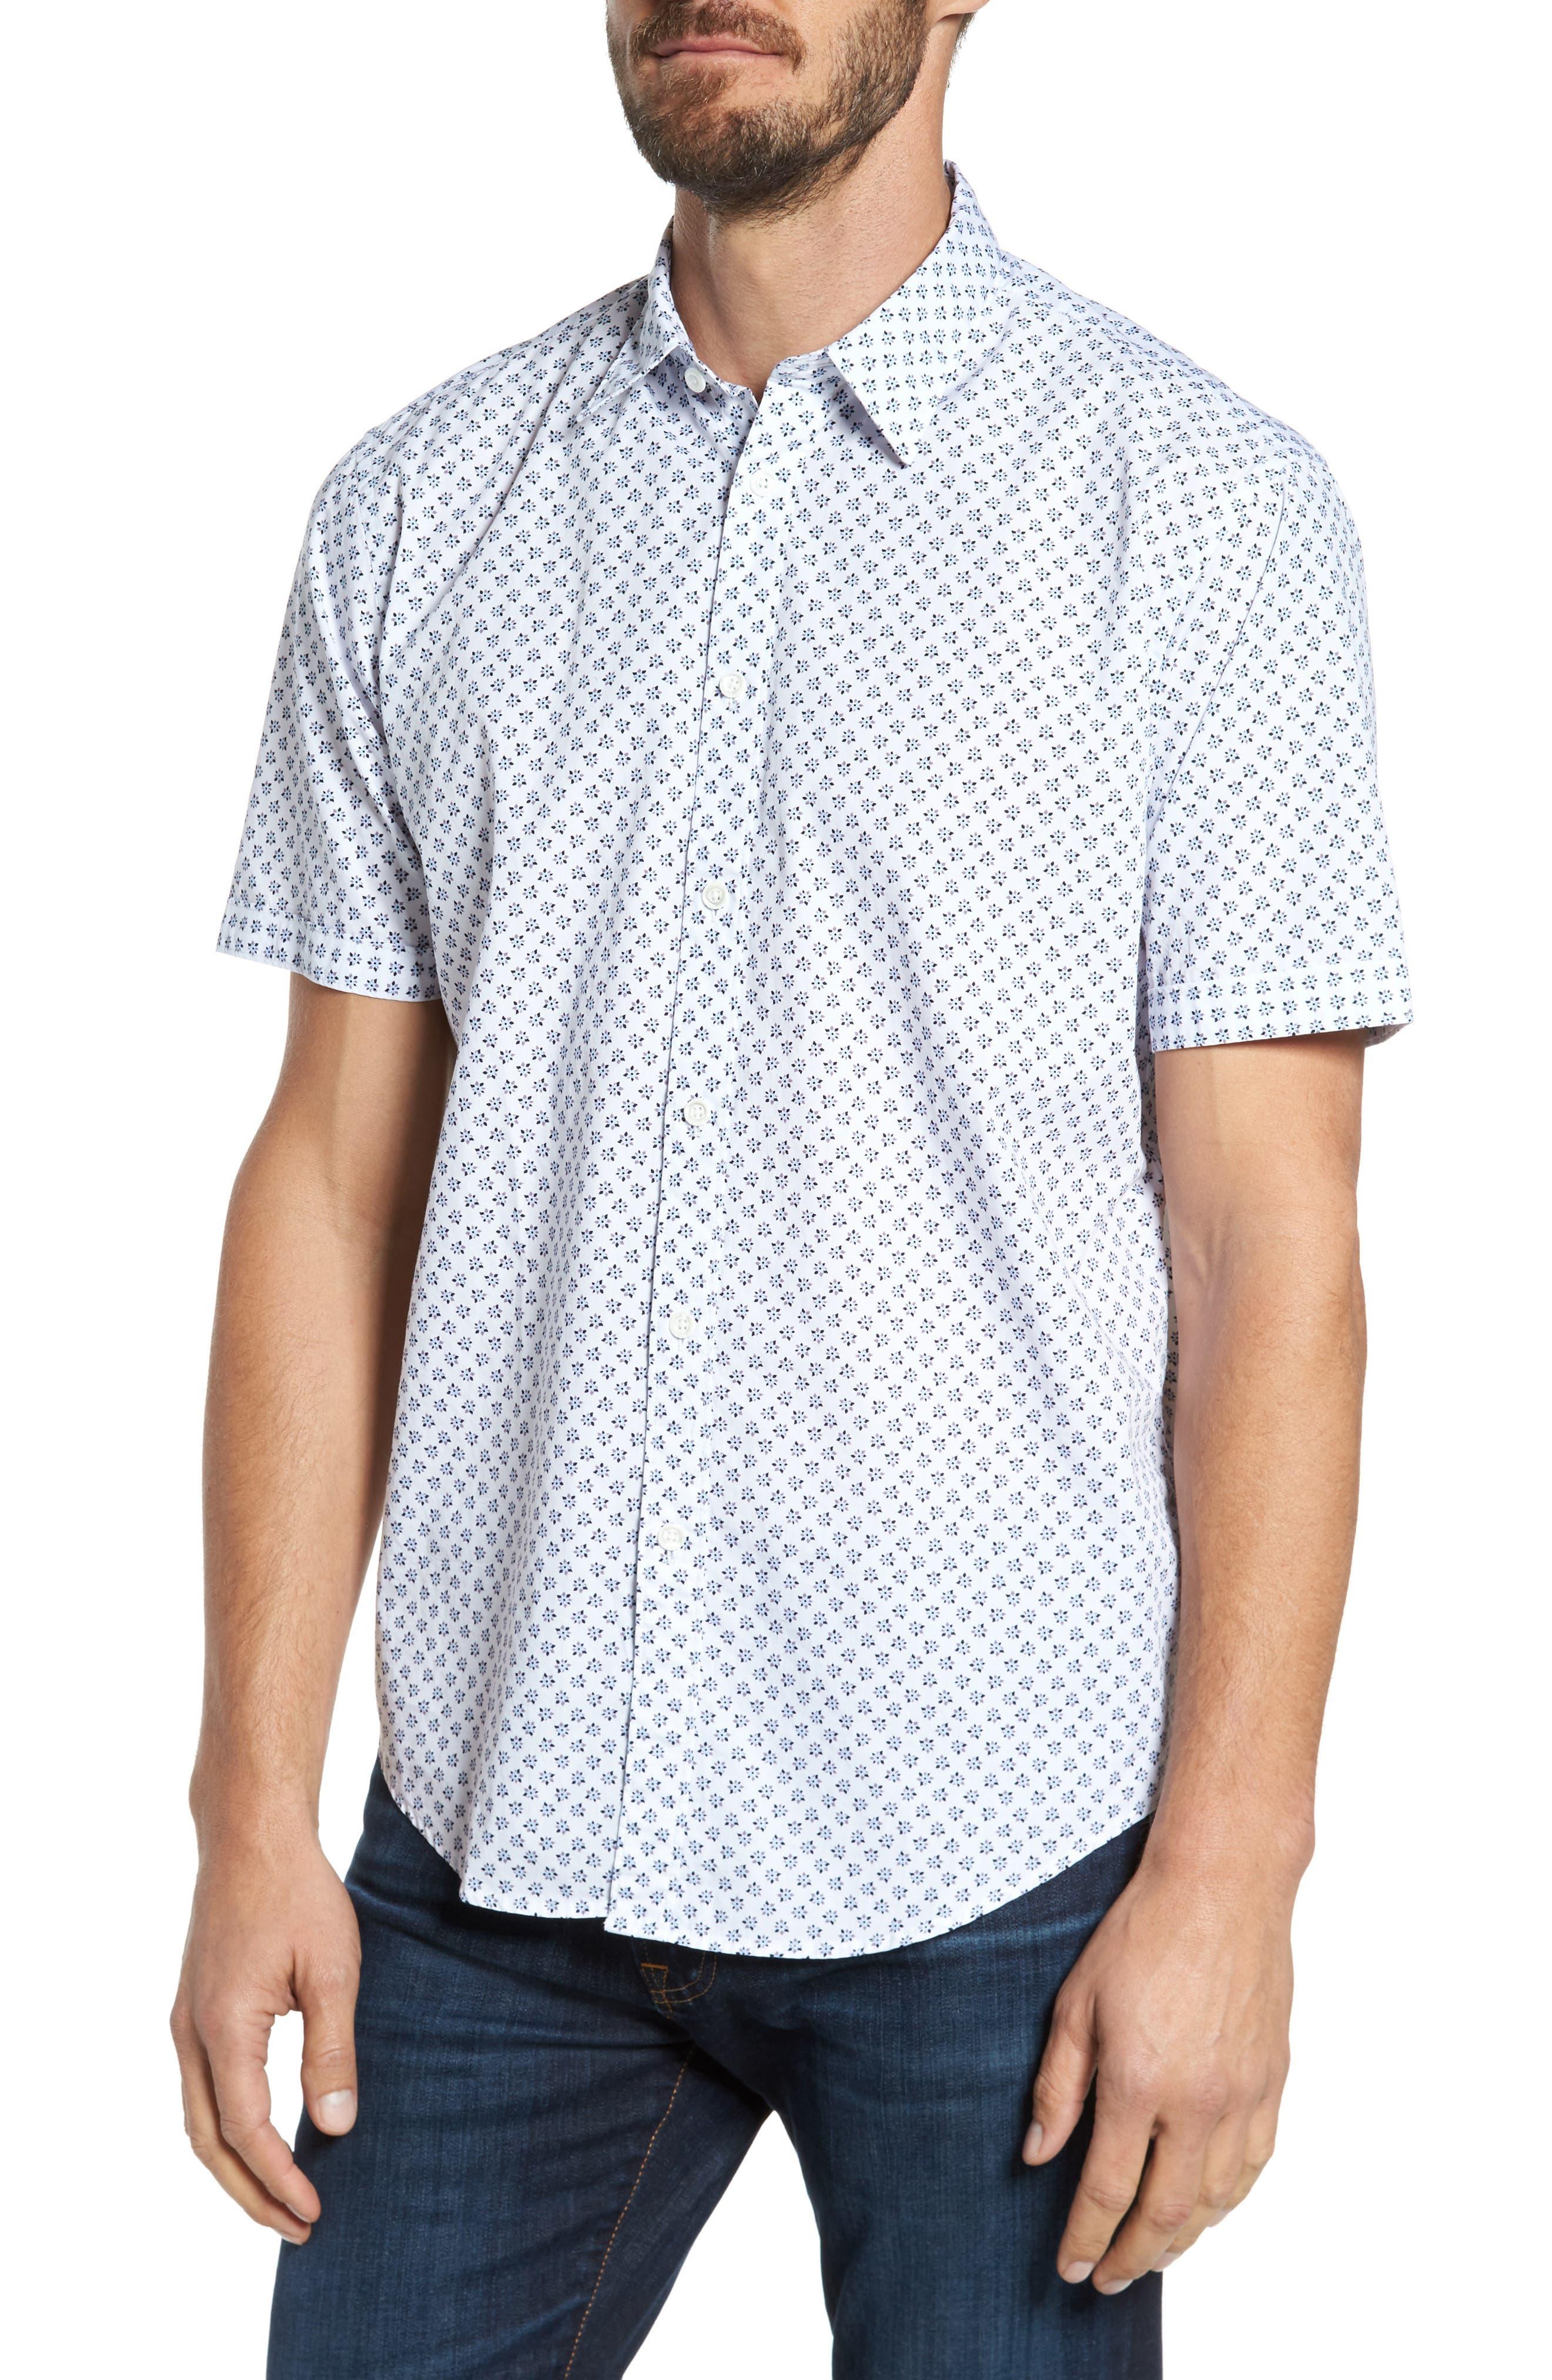 Alternate Image 1 Selected - Coastaoro Santo Regular Fit Print Sport Shirt